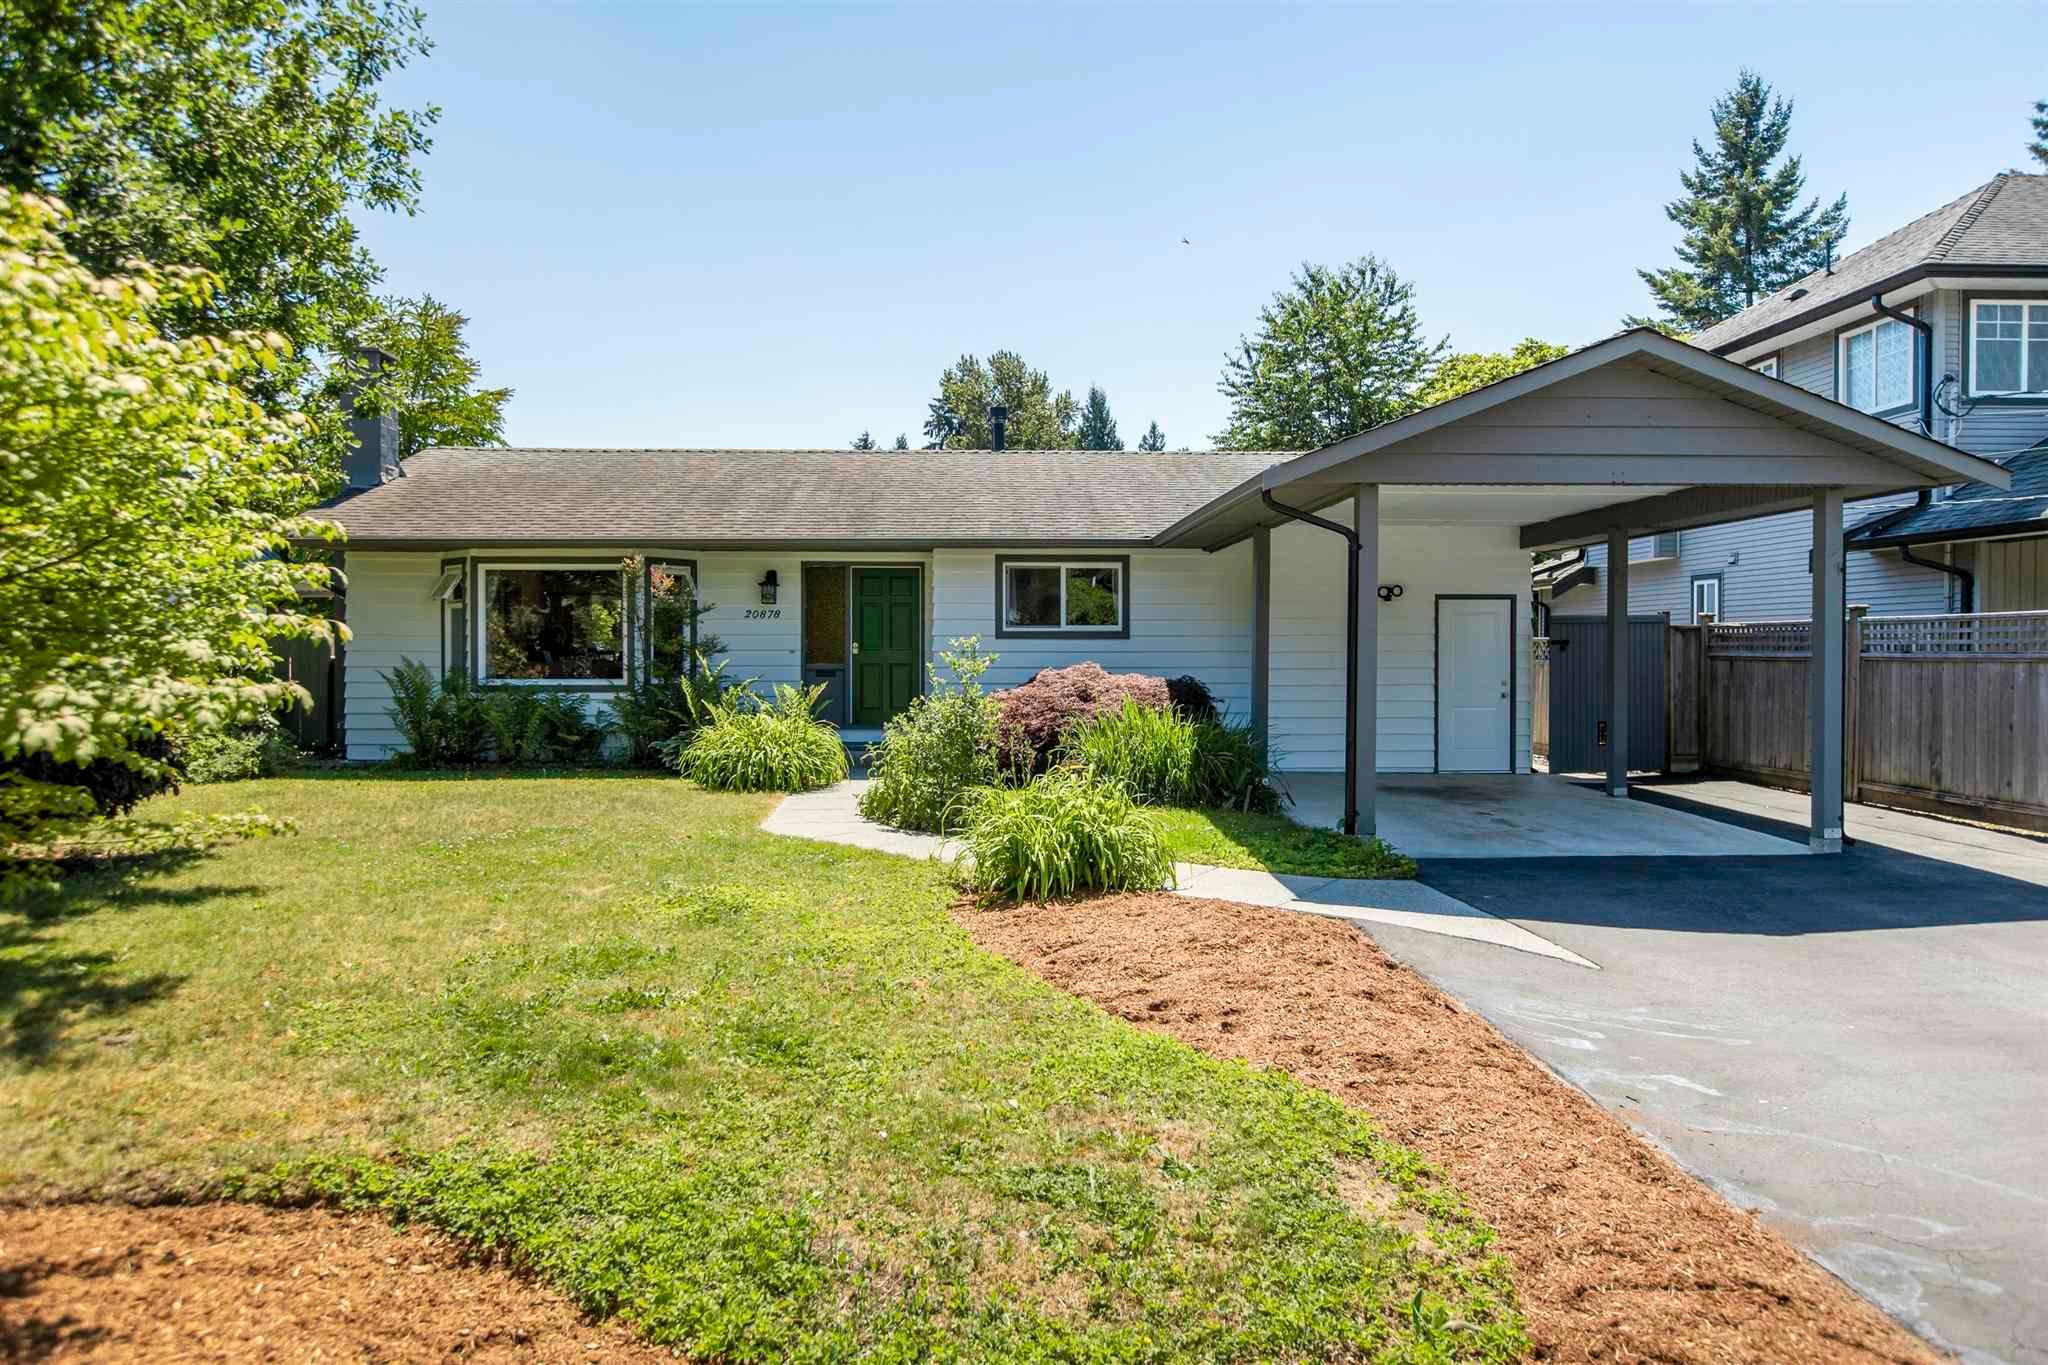 Main Photo: 20878 CAMWOOD Avenue in Maple Ridge: Southwest Maple Ridge House for sale : MLS®# R2597329